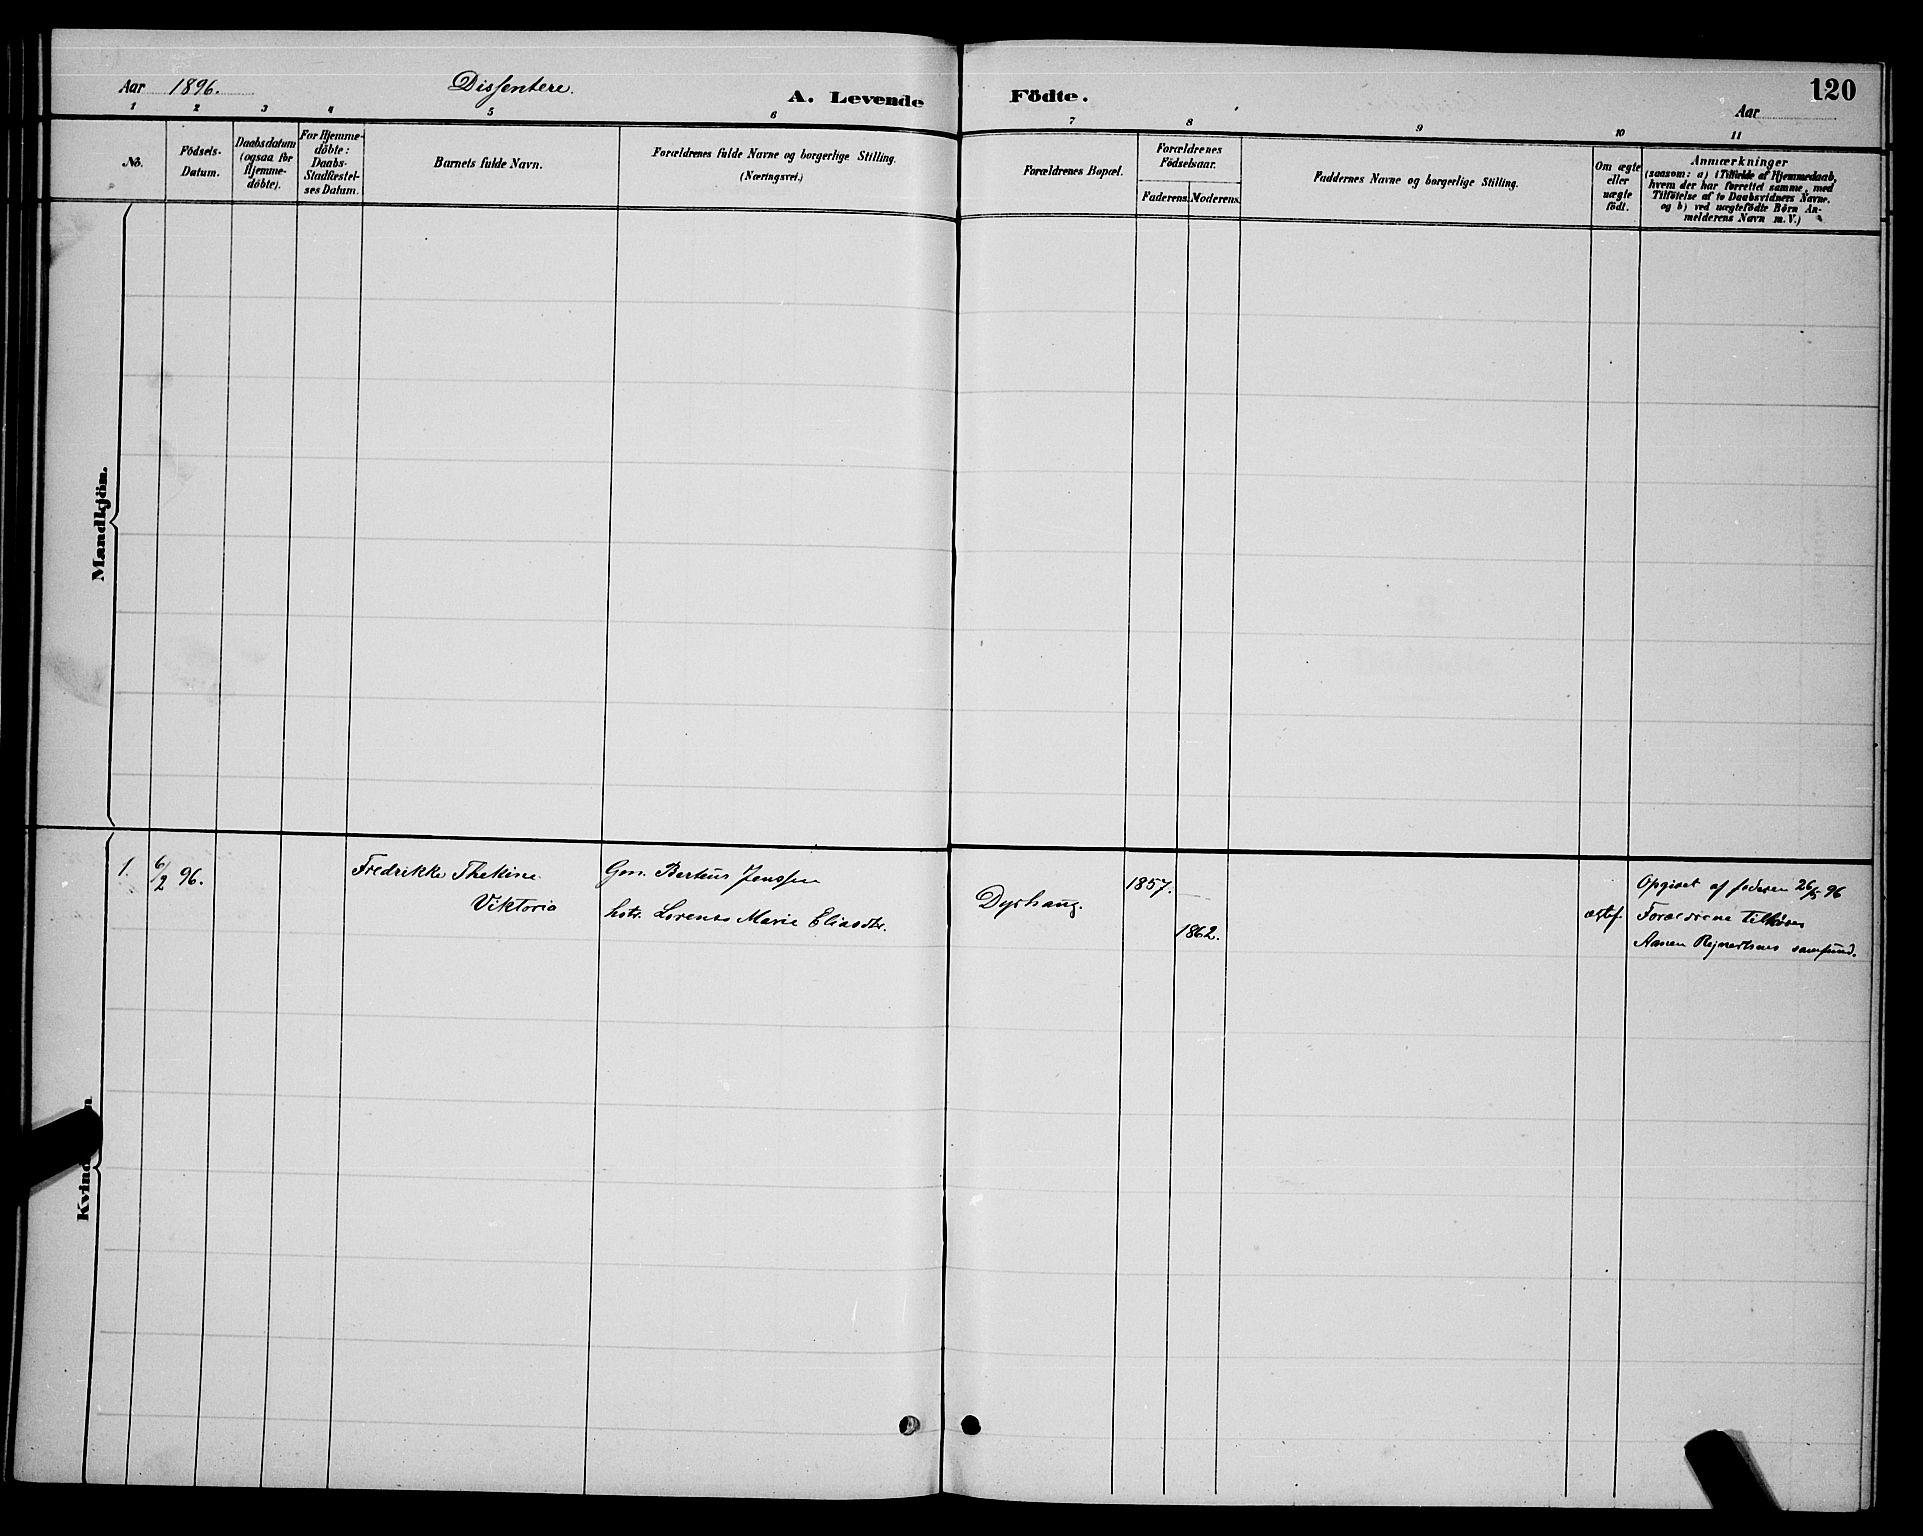 SAT, Ministerialprotokoller, klokkerbøker og fødselsregistre - Nordland, 863/L0914: Klokkerbok nr. 863C04, 1886-1897, s. 120